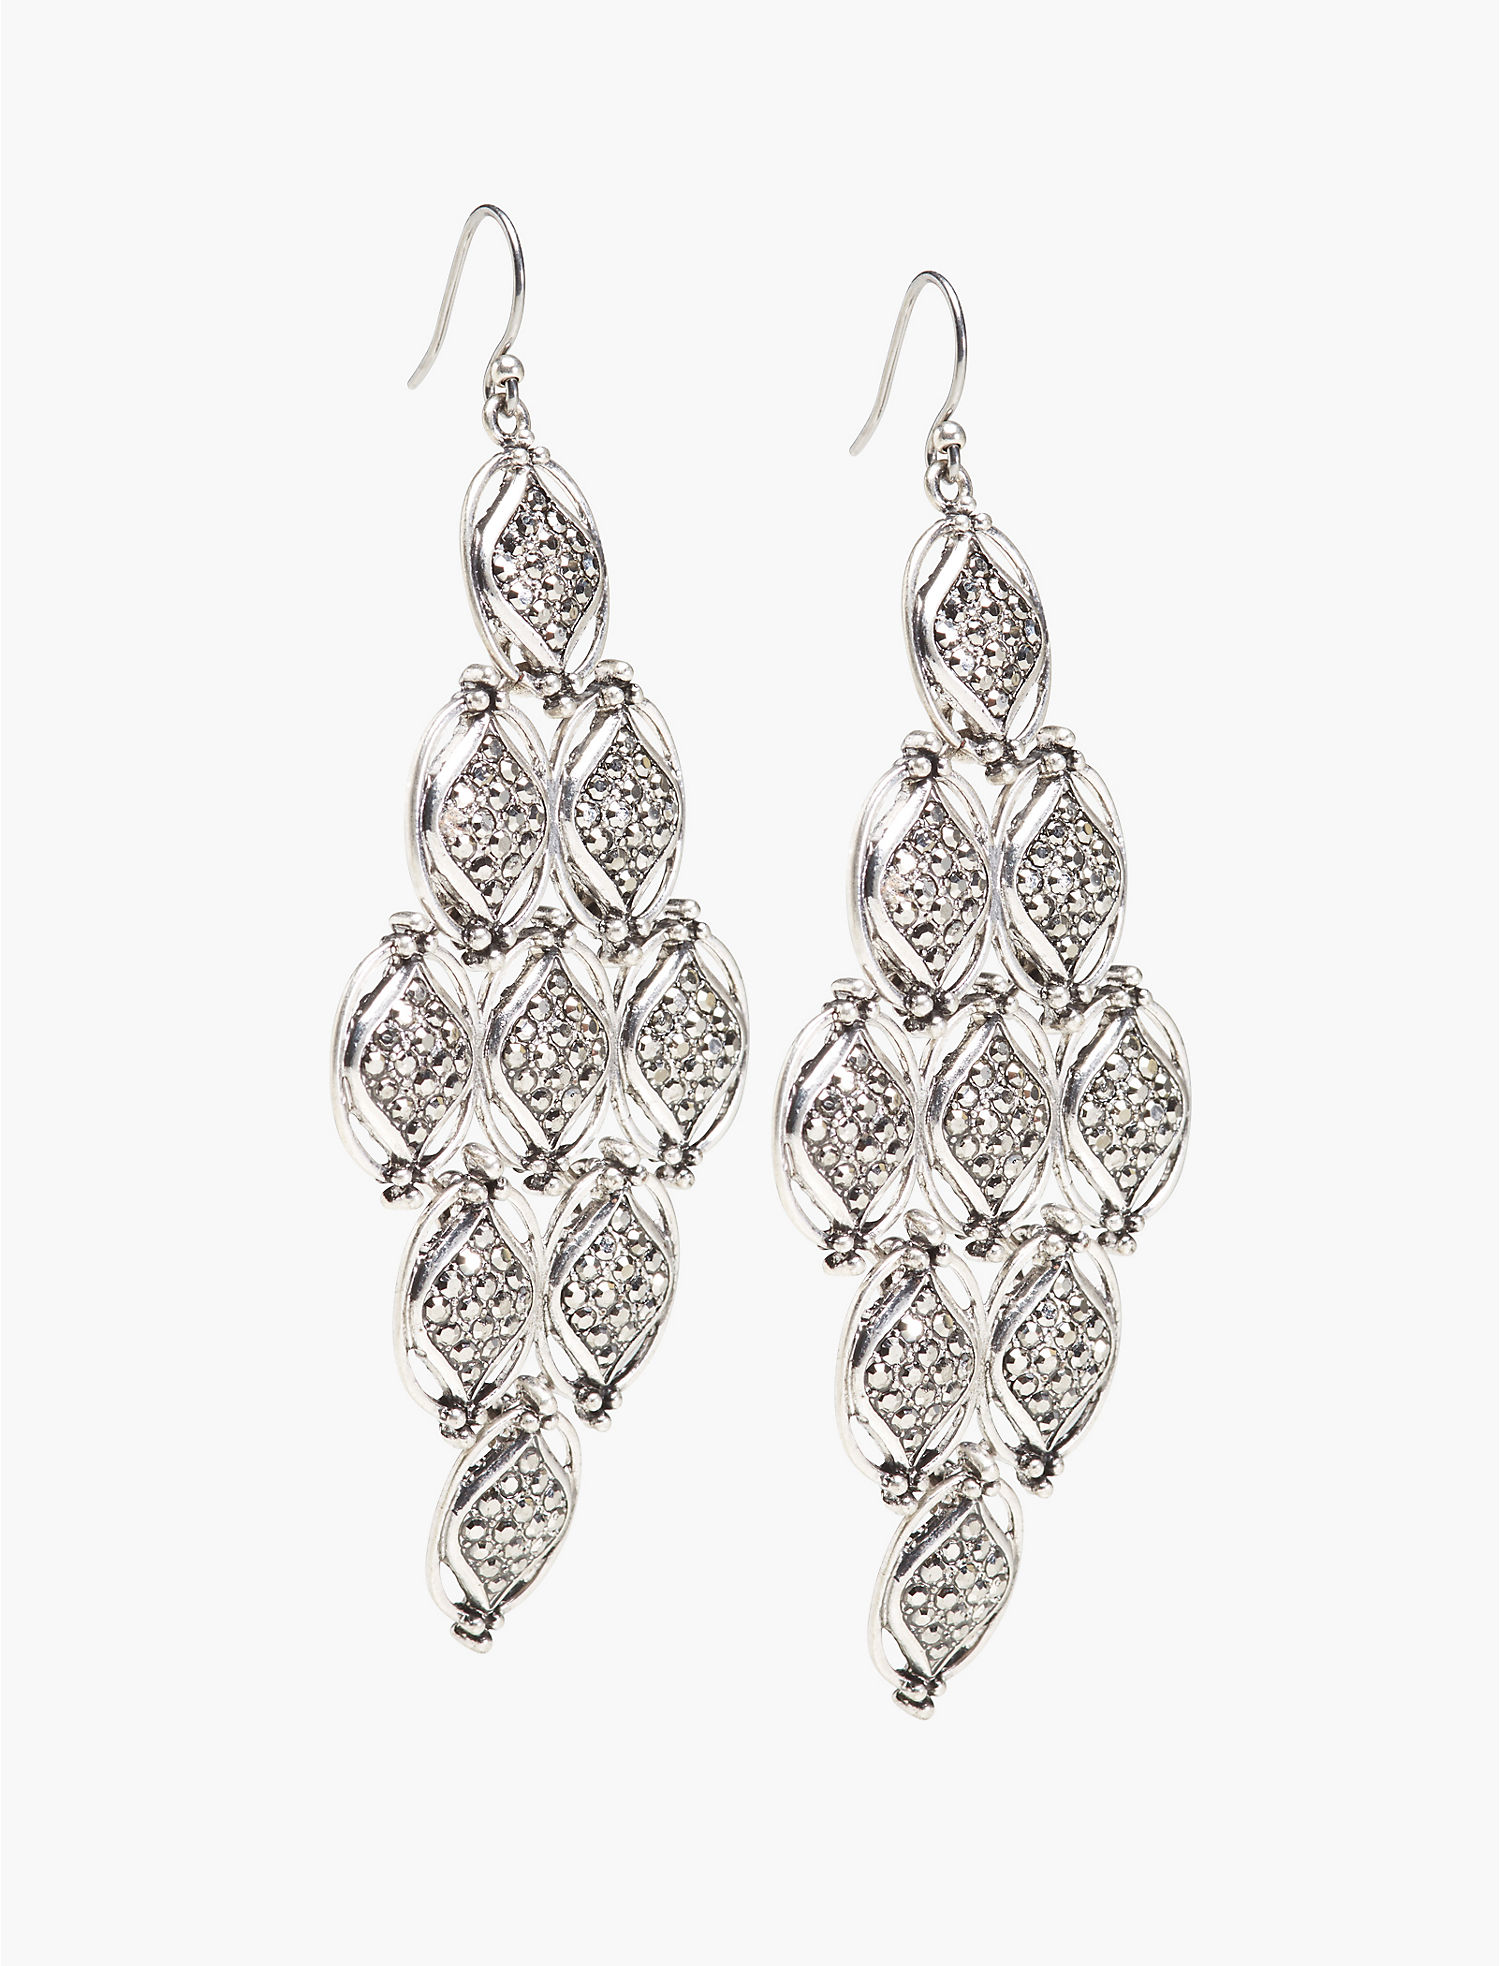 Marcasite chandelier earring lucky brand marcasite chandelier earring silver aloadofball Image collections